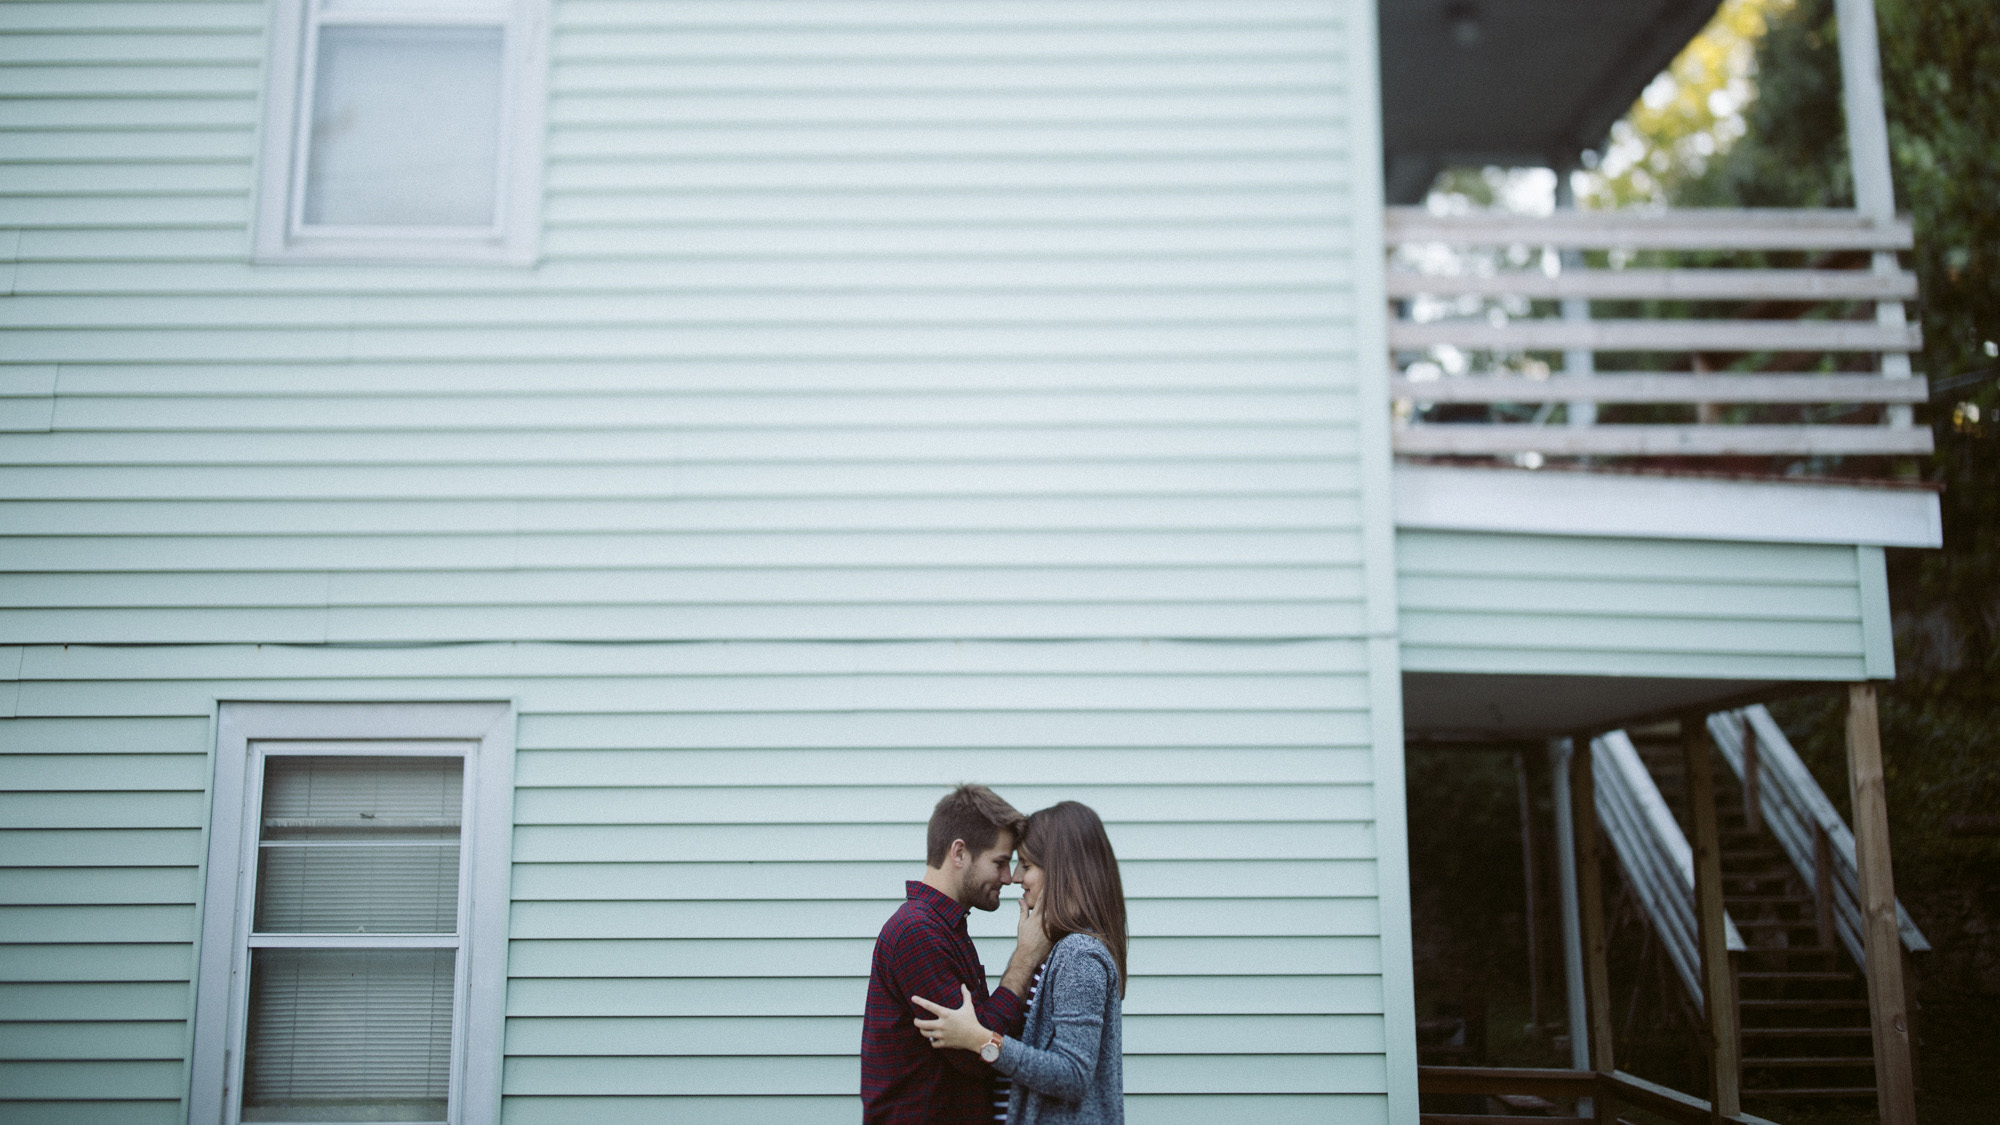 alec_vanderboom_Kansas_City_Engagement_Photos-0011.jpg